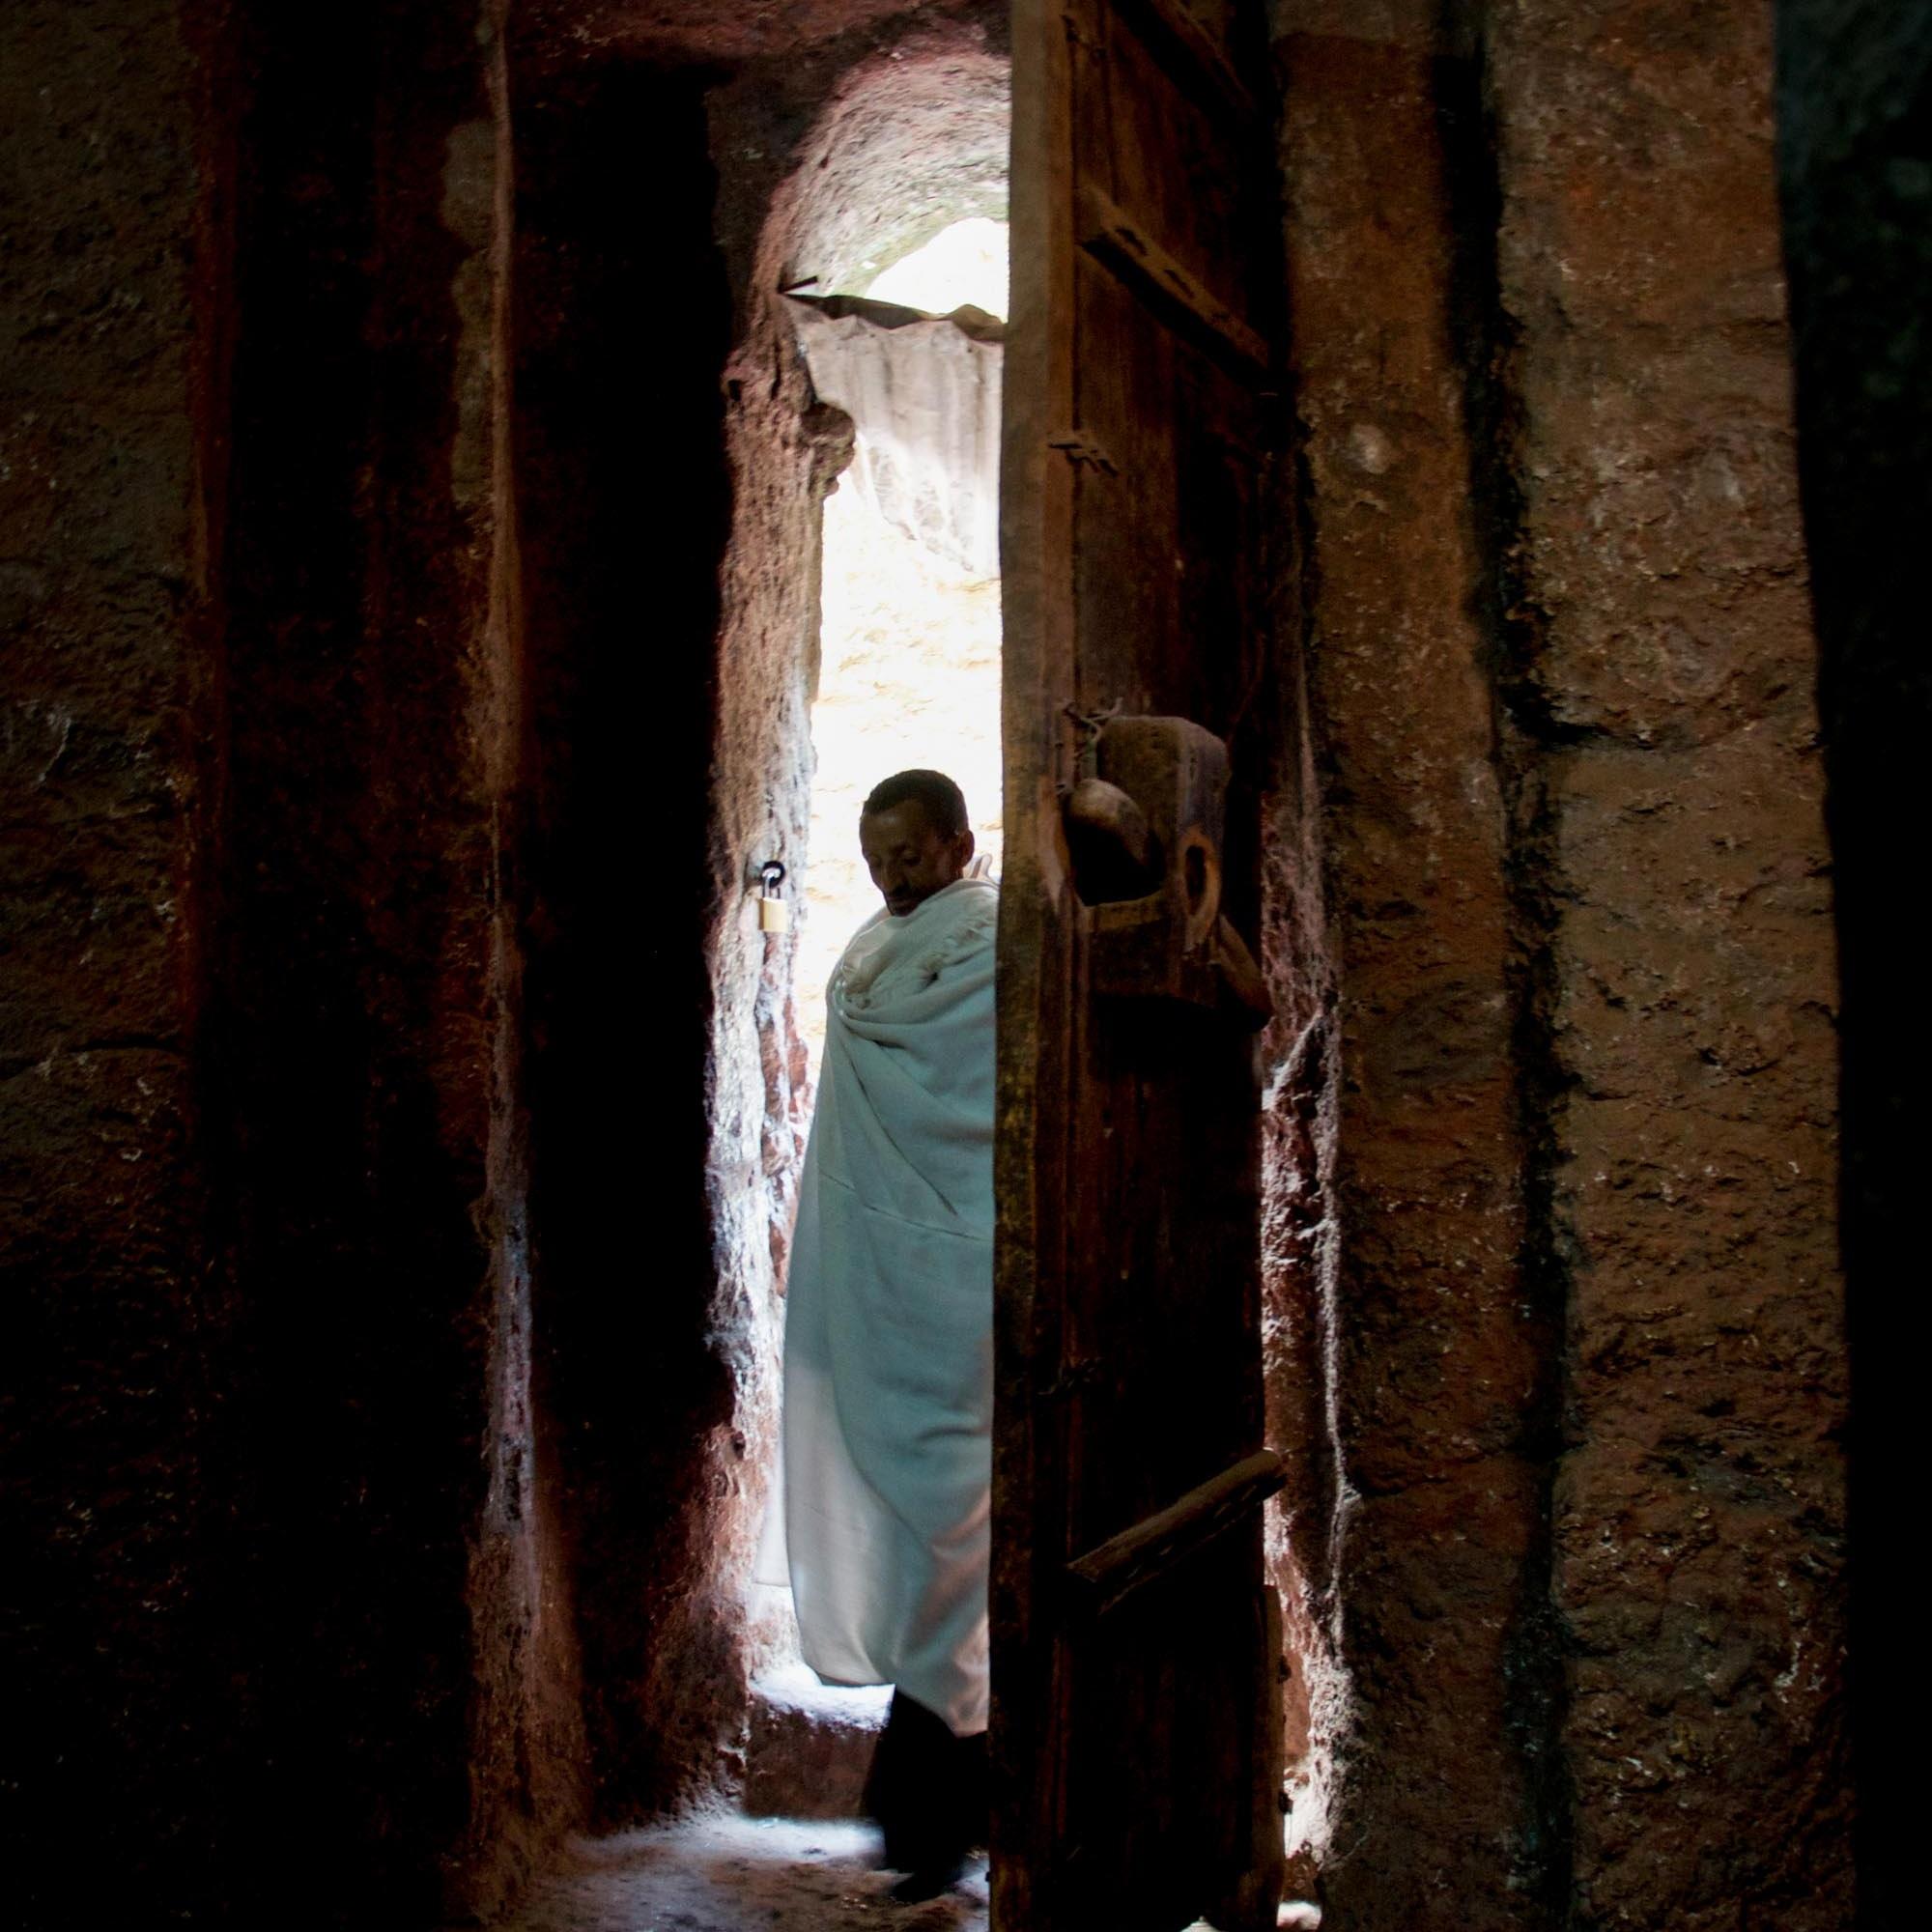 ethiopia-lalibella-pilgrim-doorway-2012-10-11.jpg